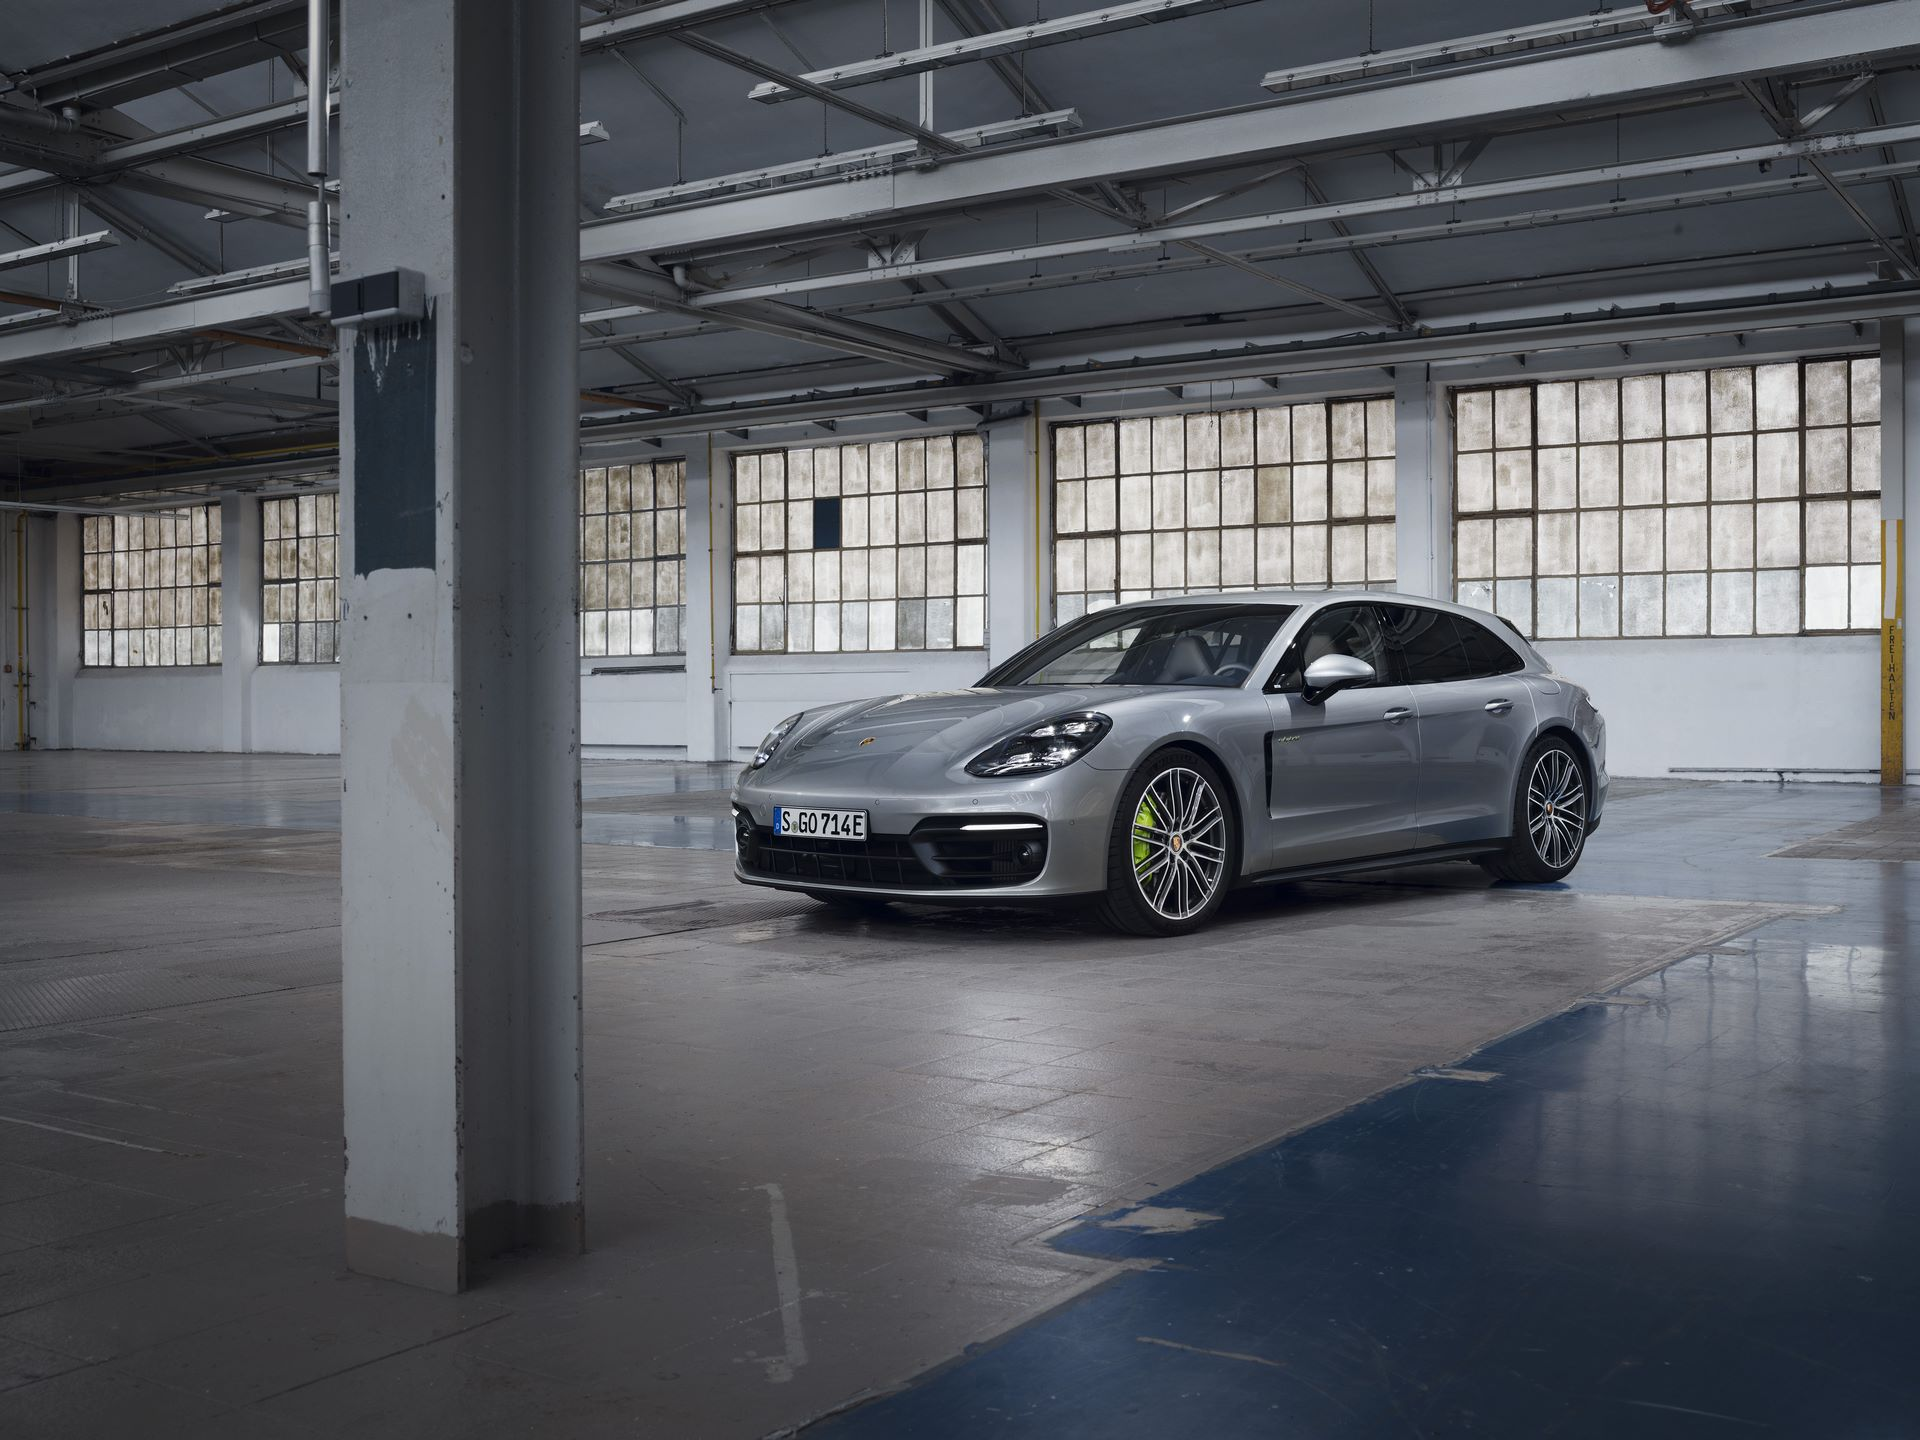 Porsche-Panamera-Turbo-S-E-Hybrid-4-E-Hybrid-and-4S-2021-4